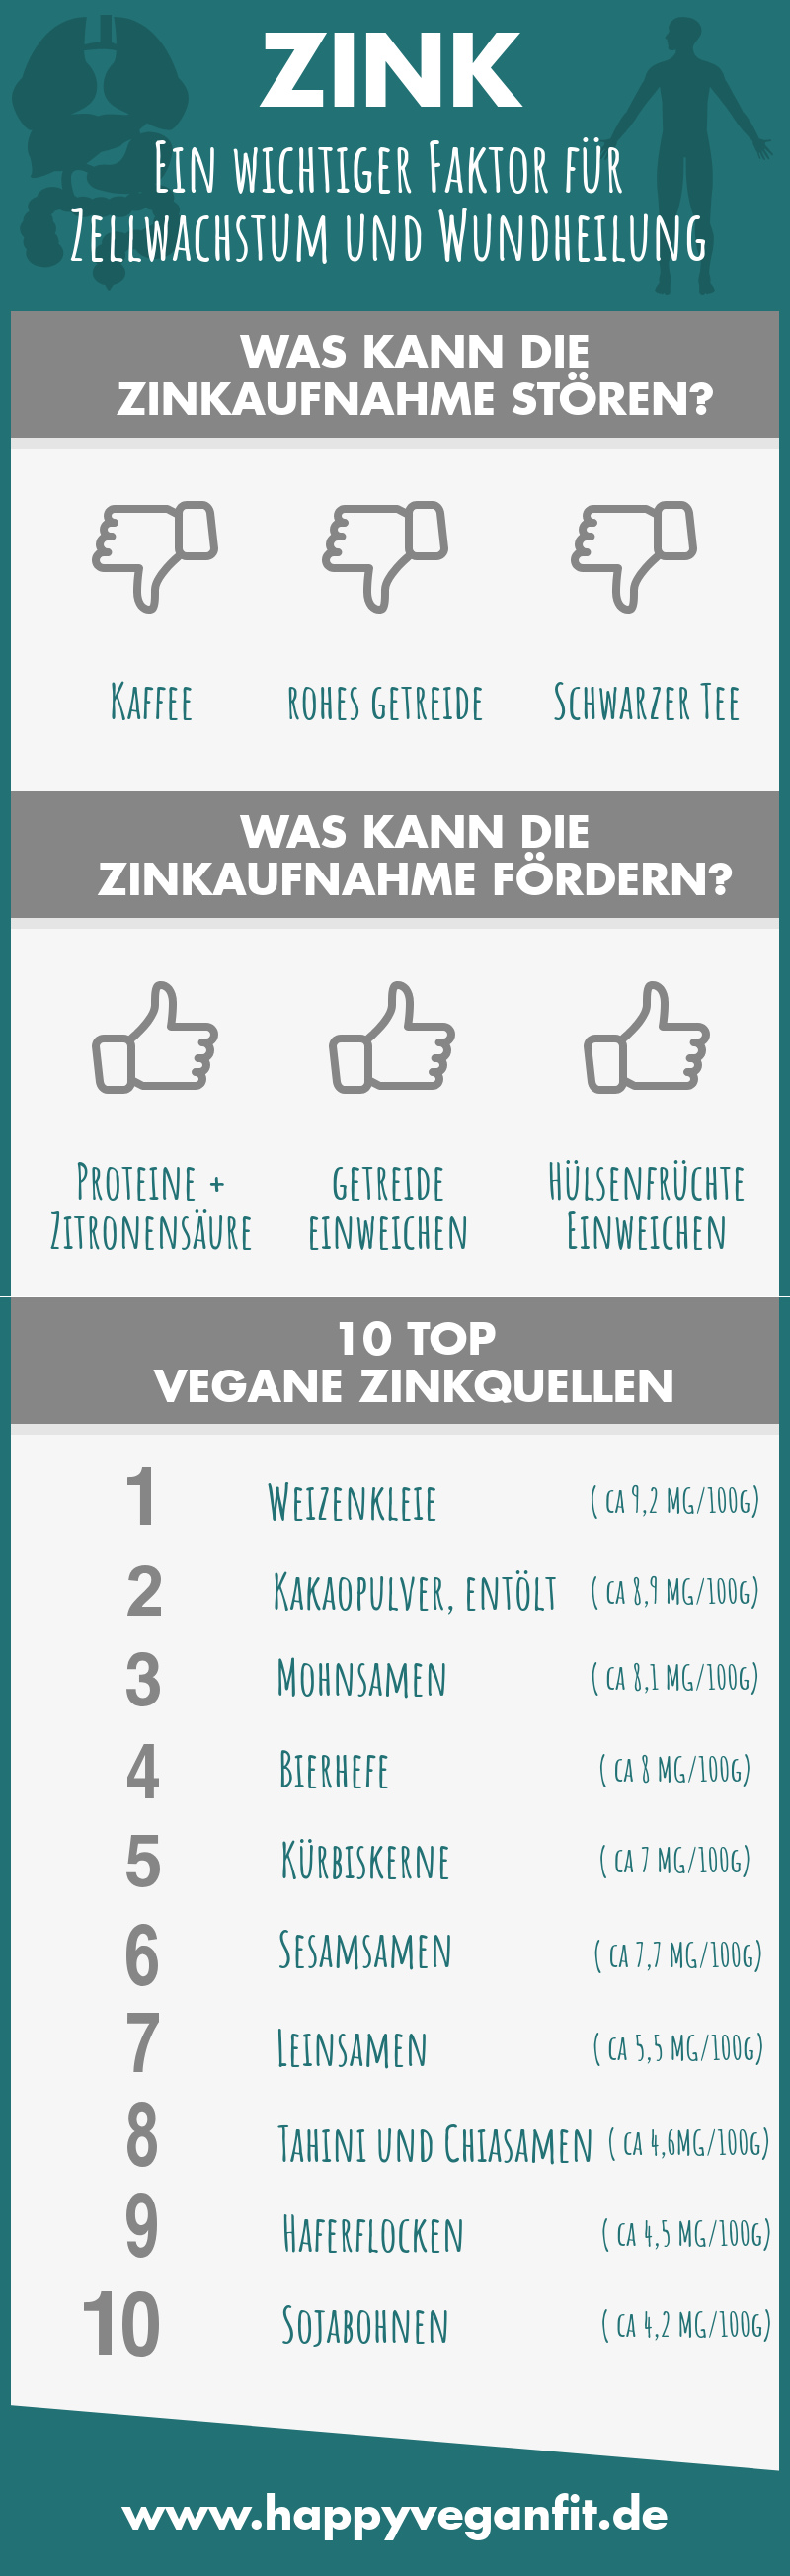 vegan abnehmen zink lebensmittel vegan infografik 2